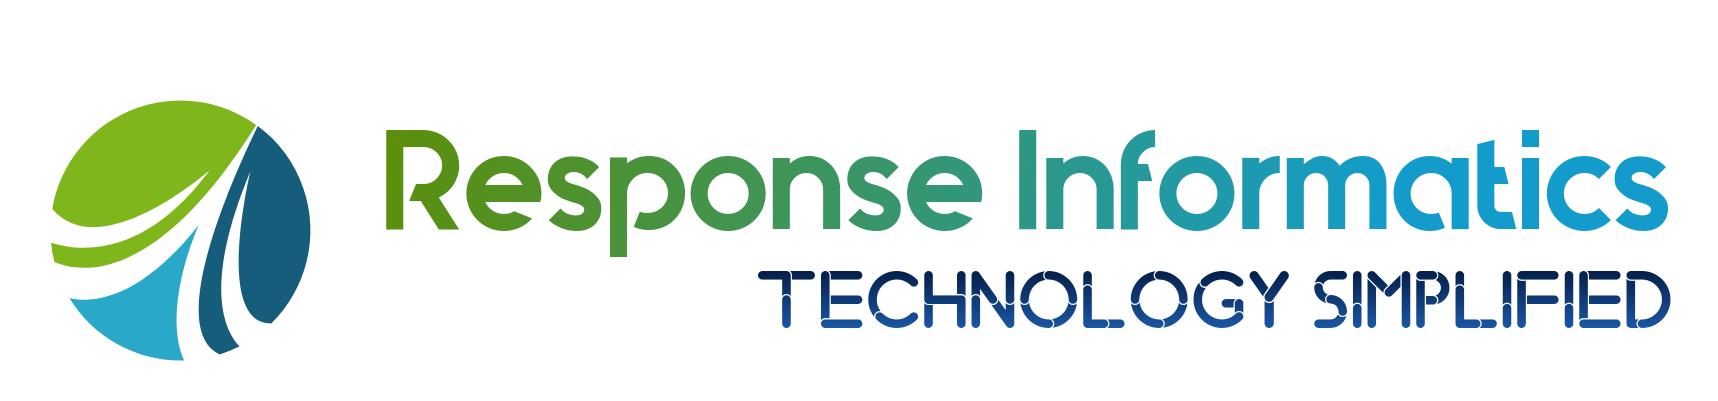 Response Informatics Inc